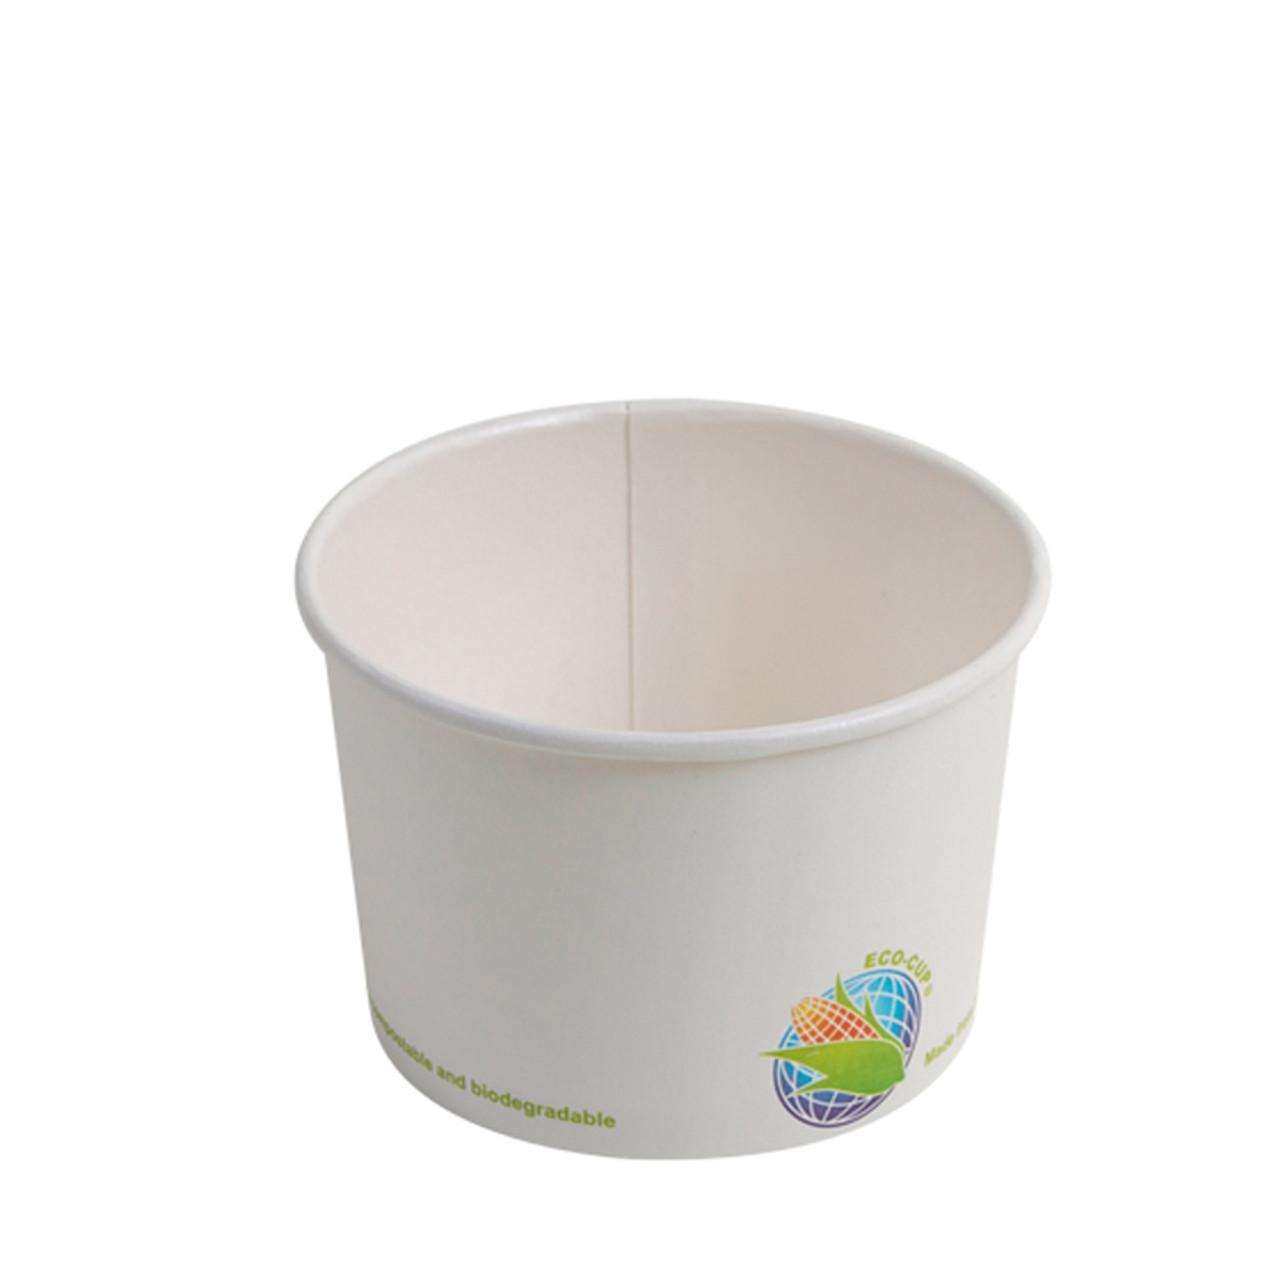 10oz paper soup container